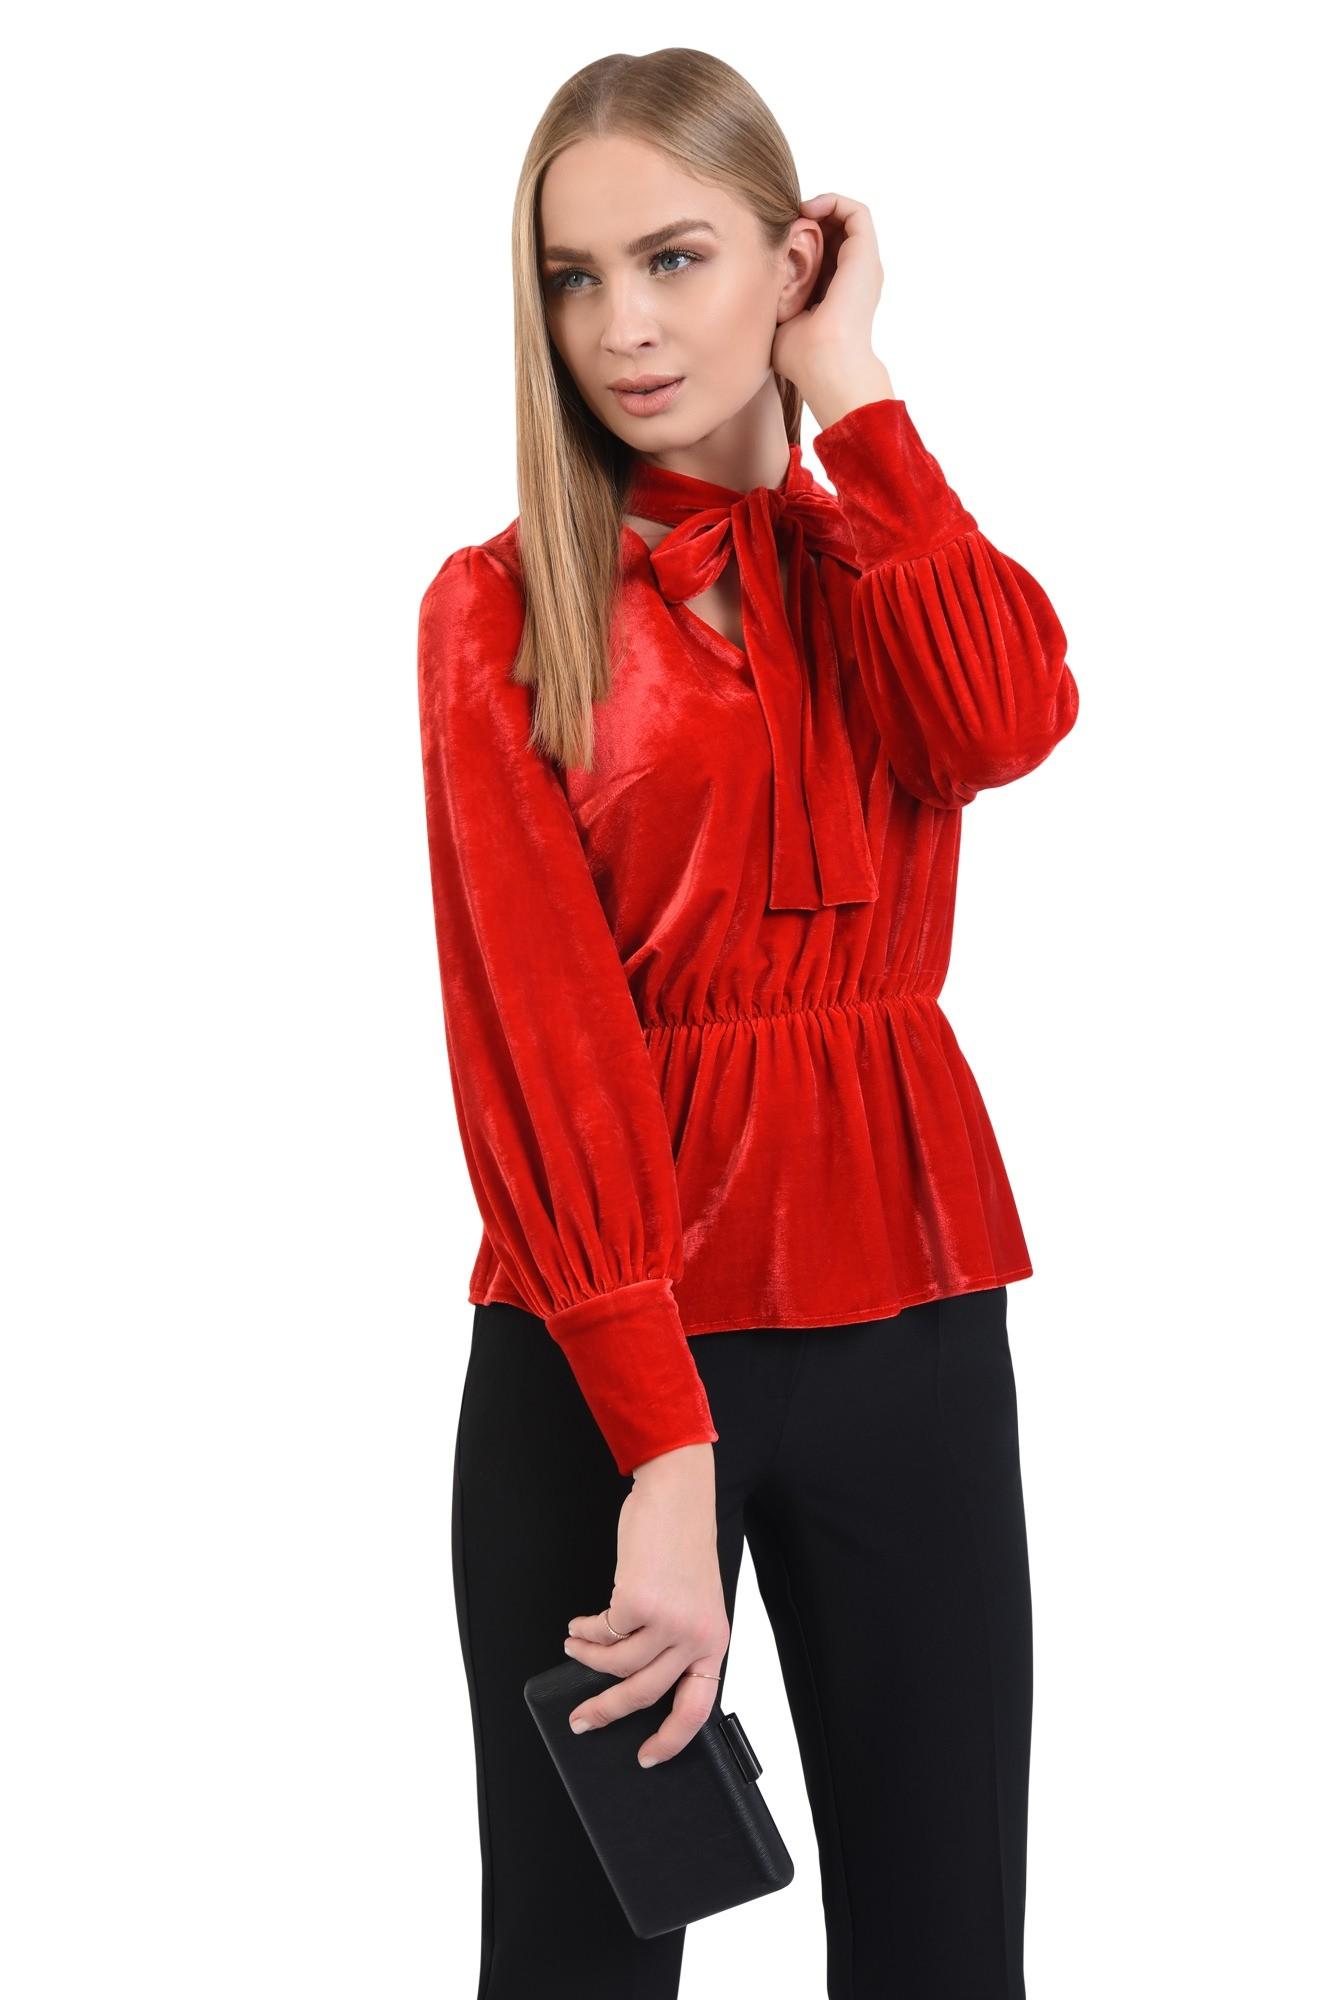 0 - bluza din catifea, rosie, eleganta, bluza dama, online